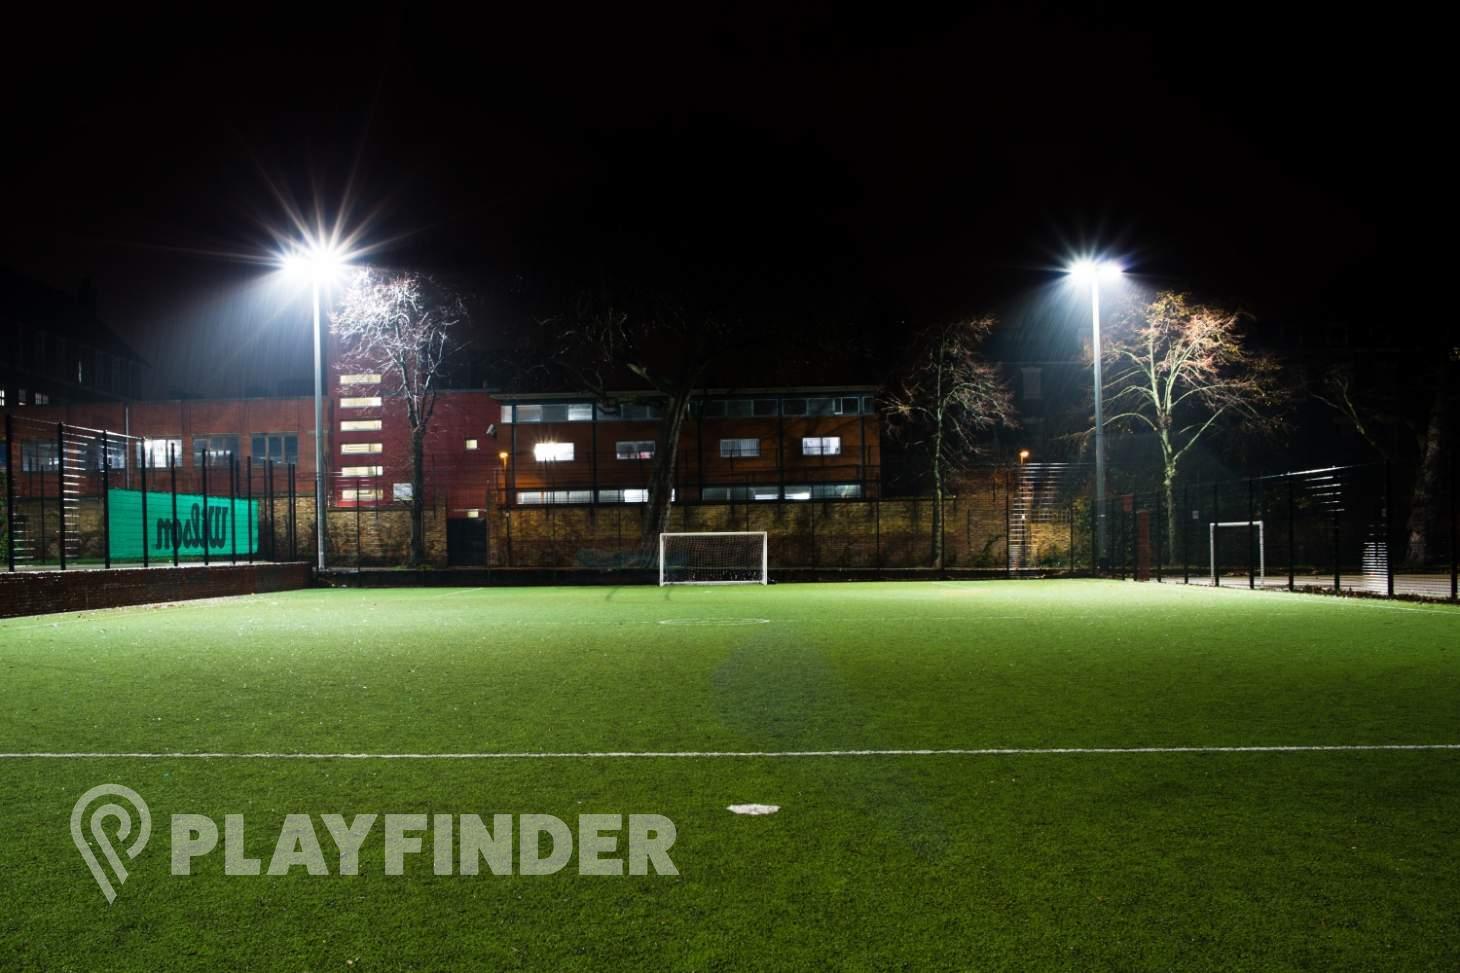 Highbury Fields 7 a side | 3G Astroturf football pitch